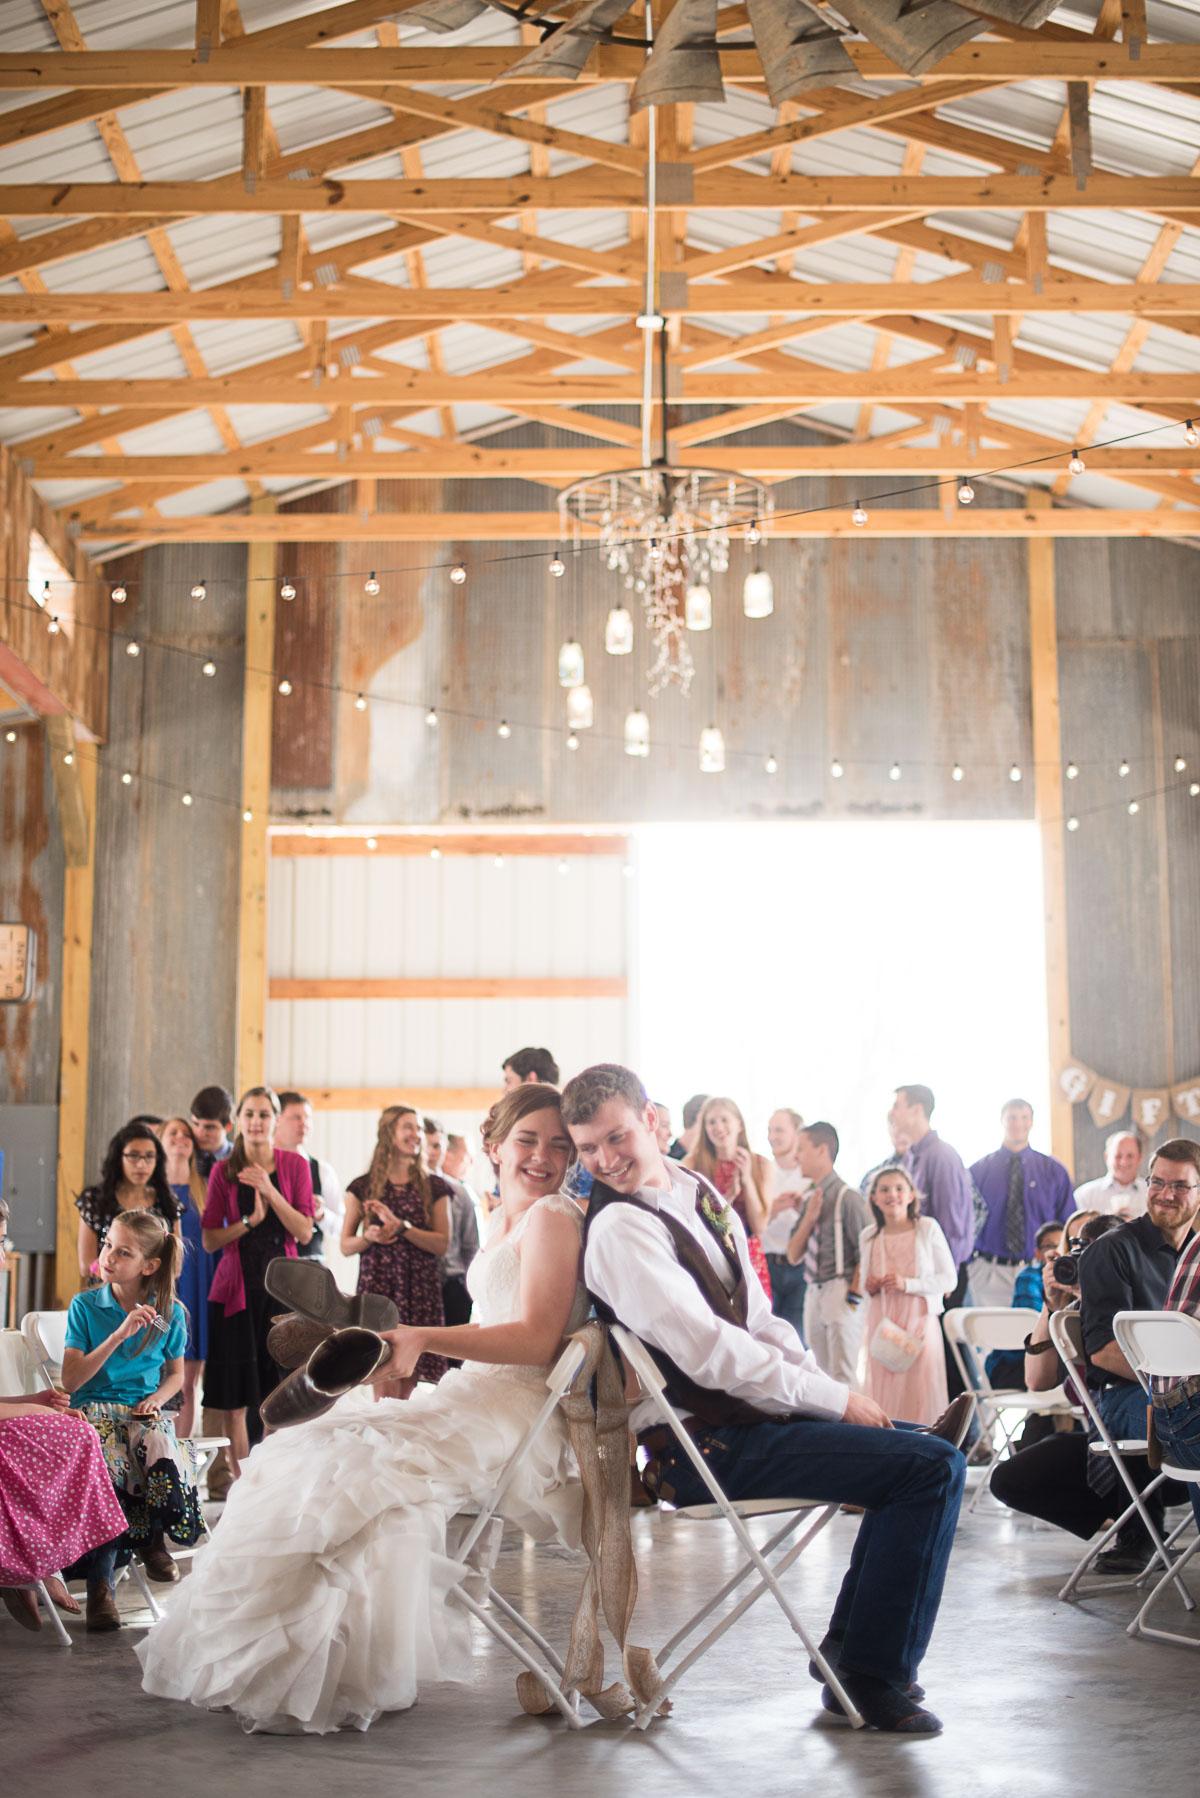 Austin Texas Wedding Photographer Barn Wedding at Nelson Farm in Manhattan Kansas-77.JPG